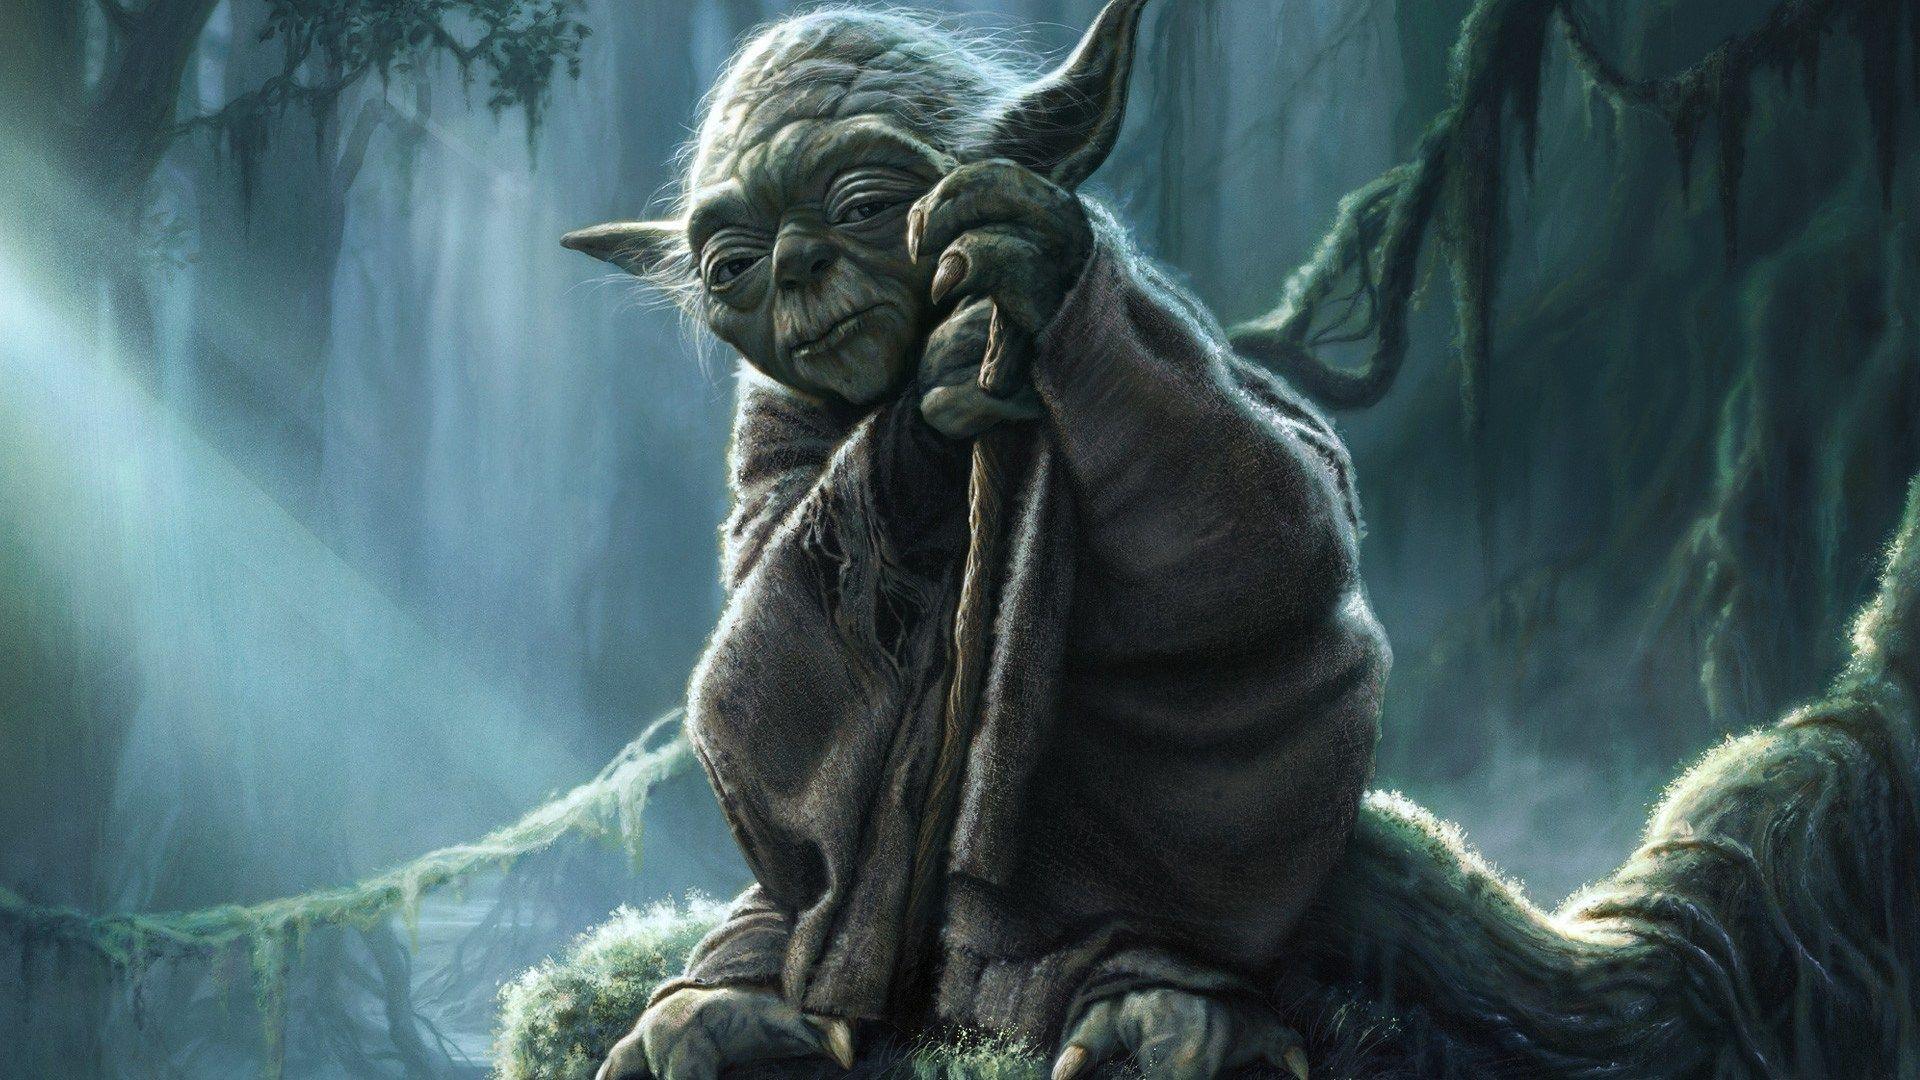 Starwars Wallpaper Cellphone: 46 Best Free Yoda Star Wars Phone Wallpapers